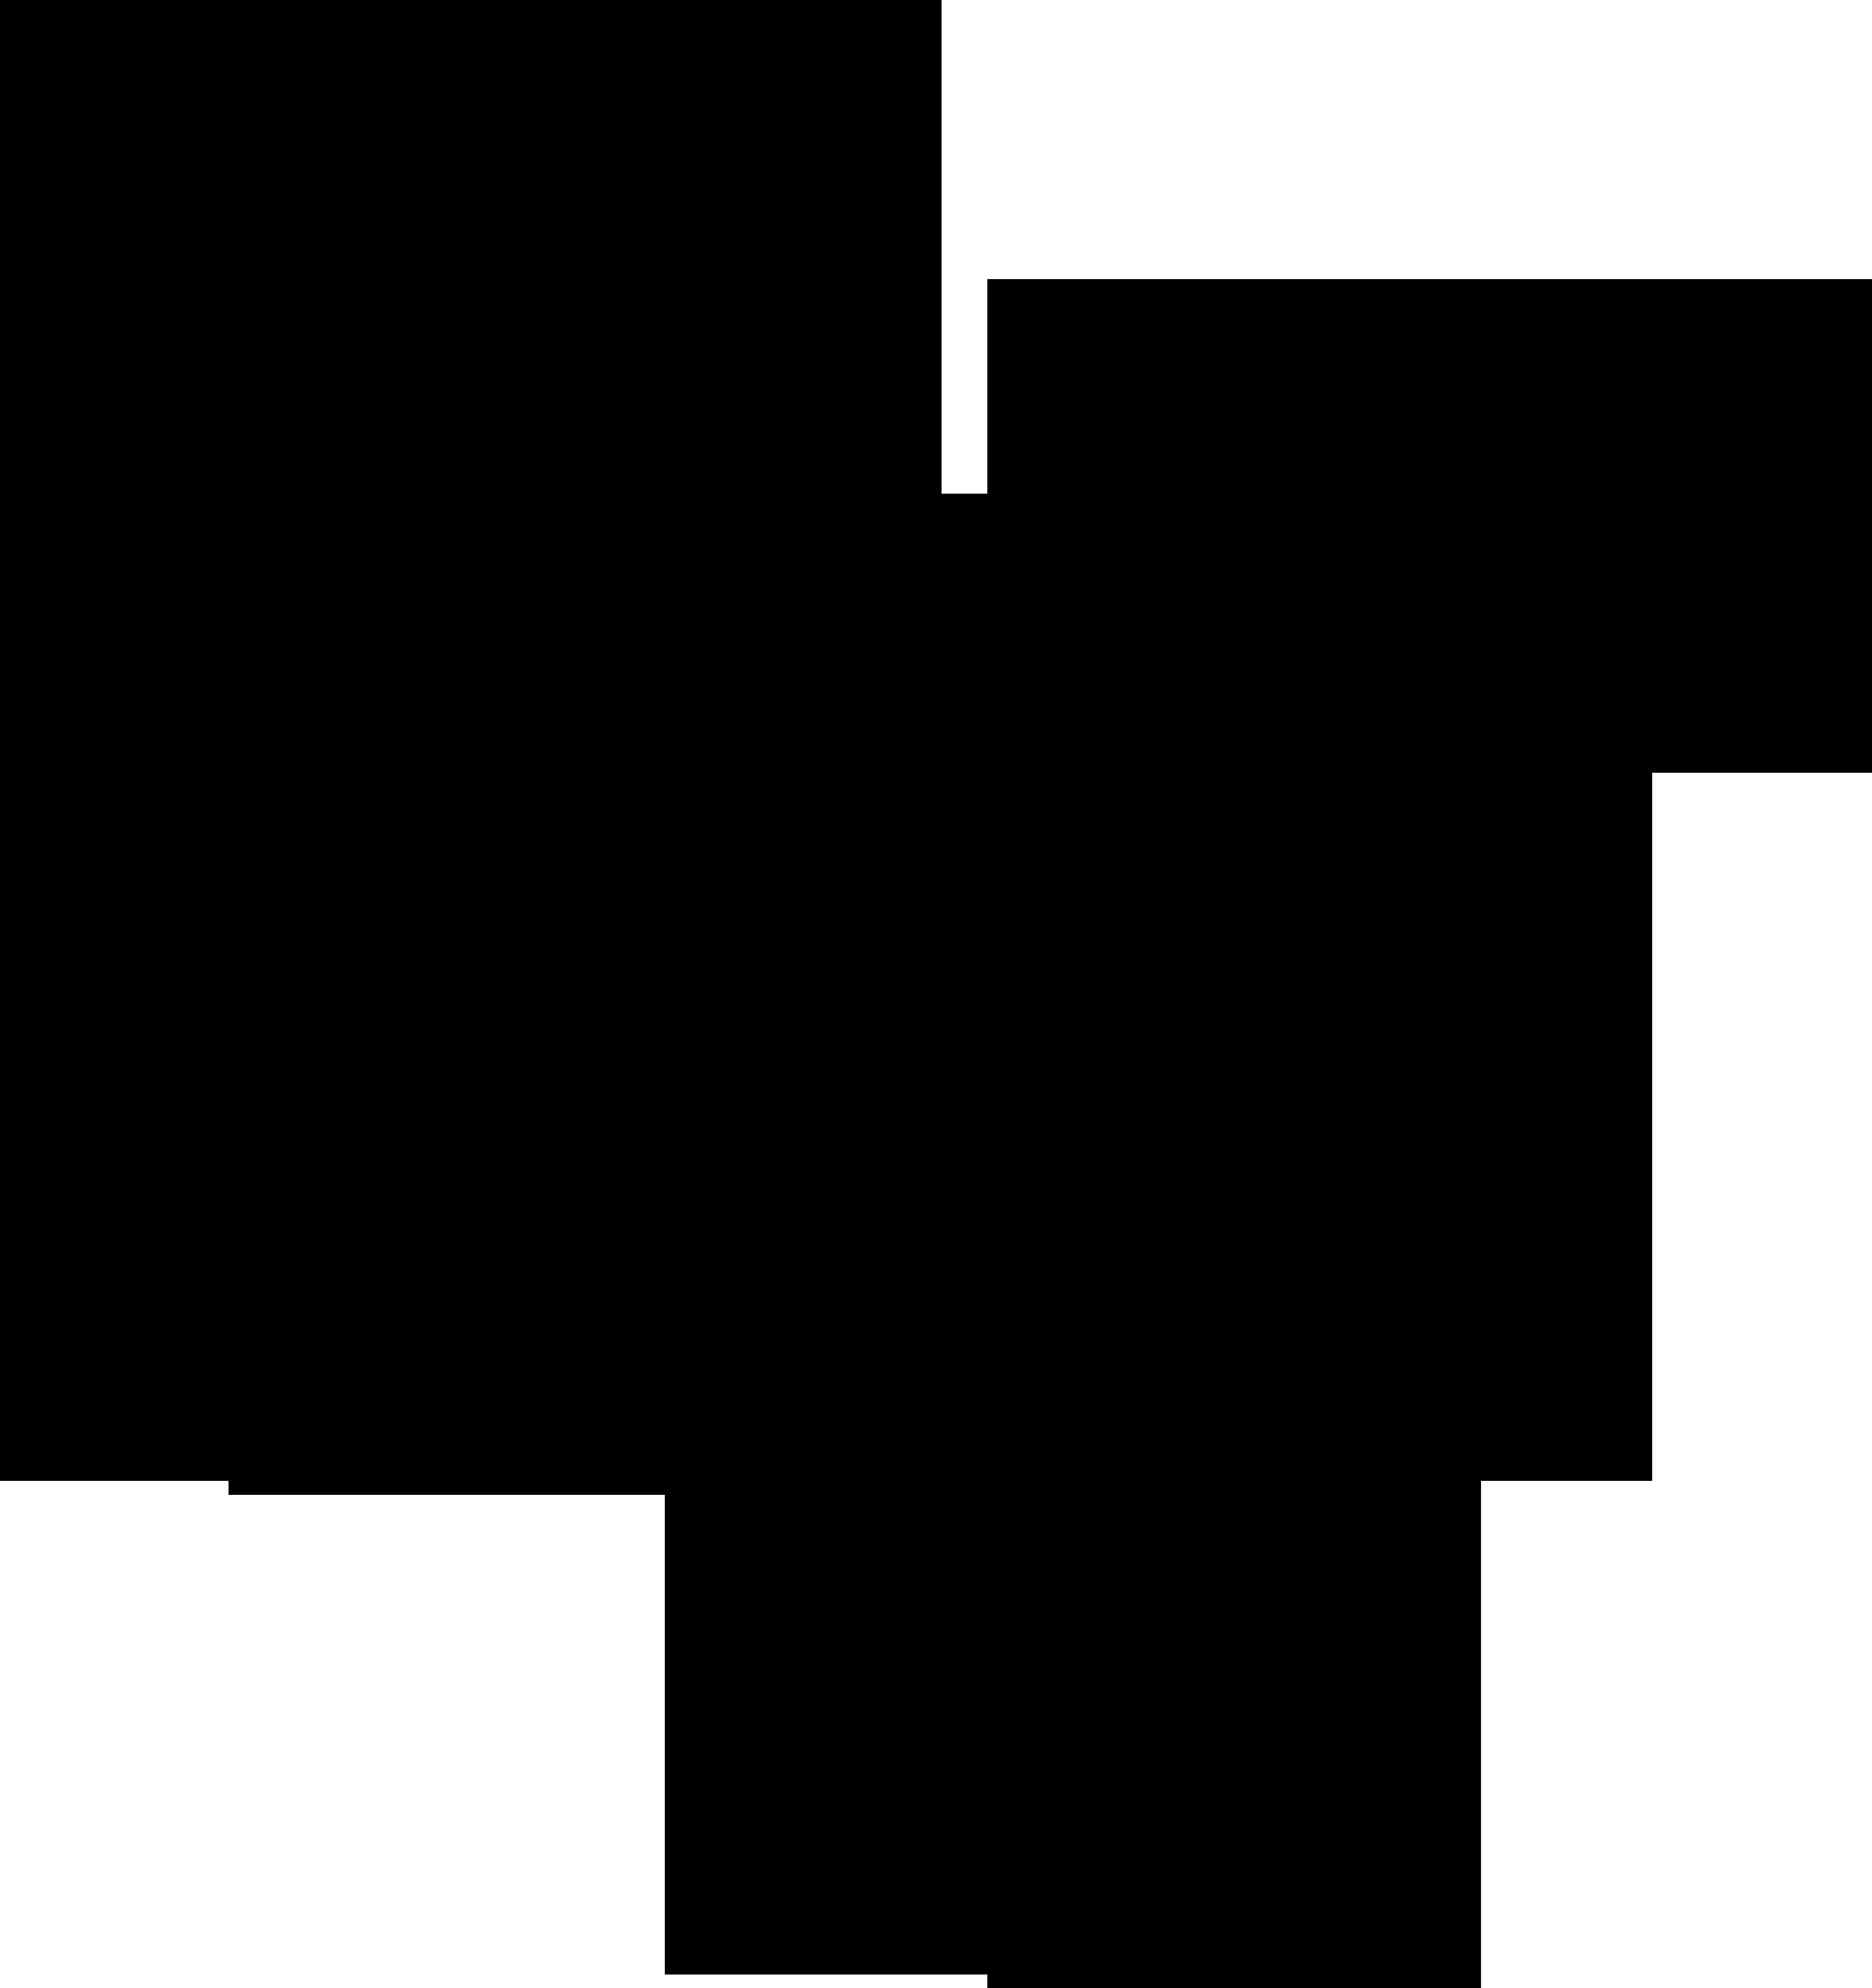 Nonbinary symbol interlocked with a nonbinary man and woman symbol.